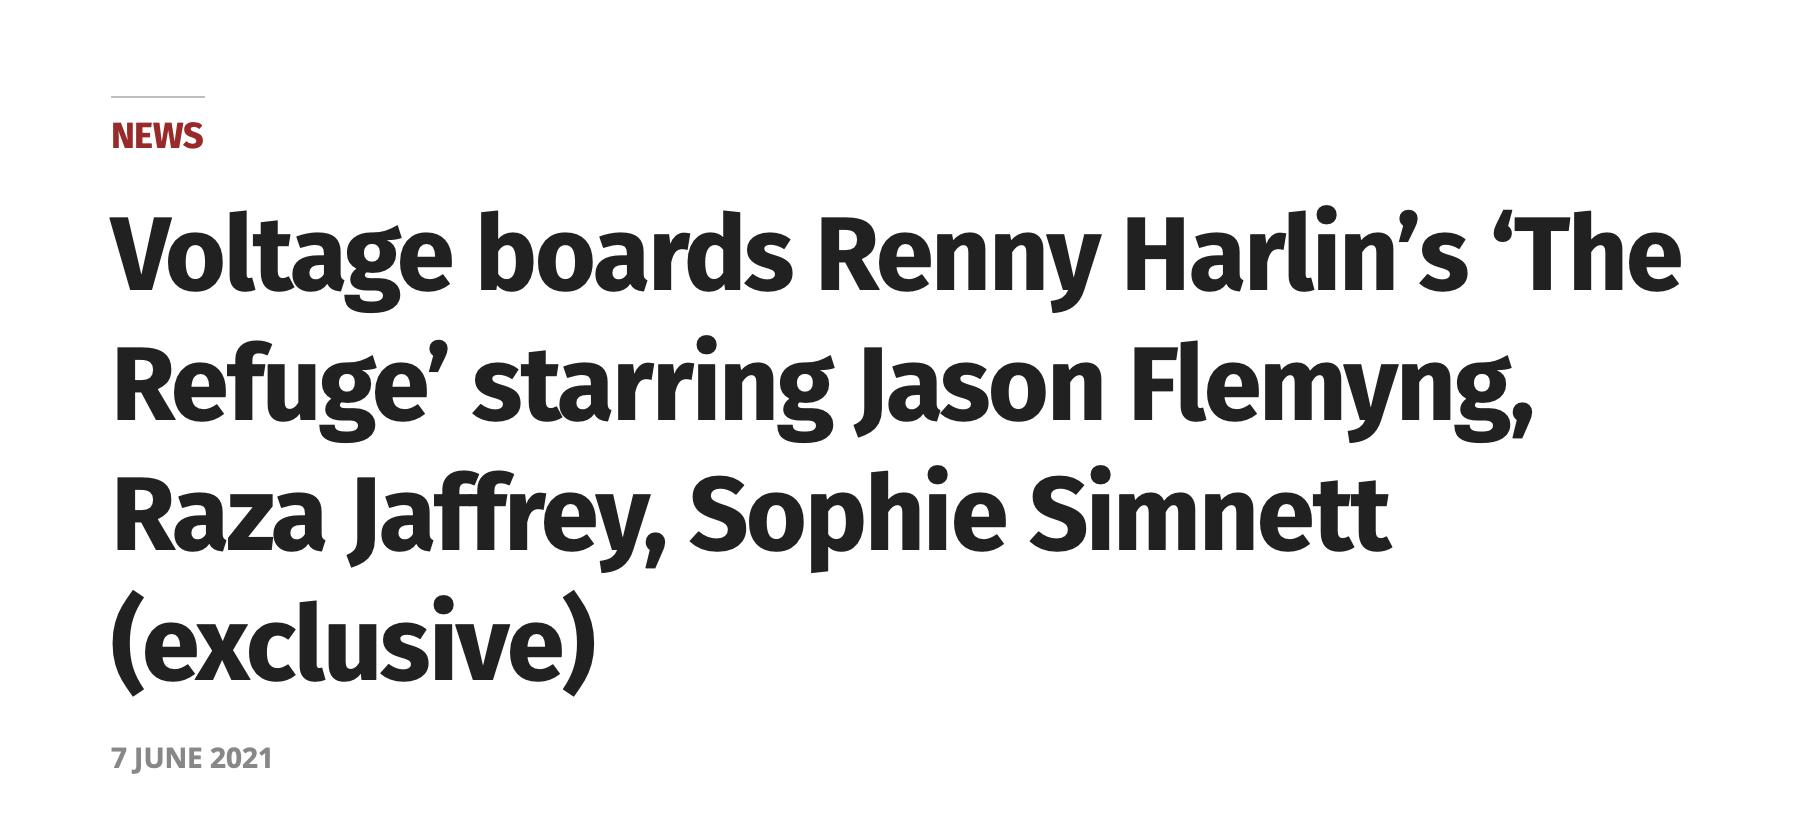 Voltage boards Renny Harlin's 'The Refuge' starring Jason Flemyng, Raza Jaffrey, Sophie Simnett